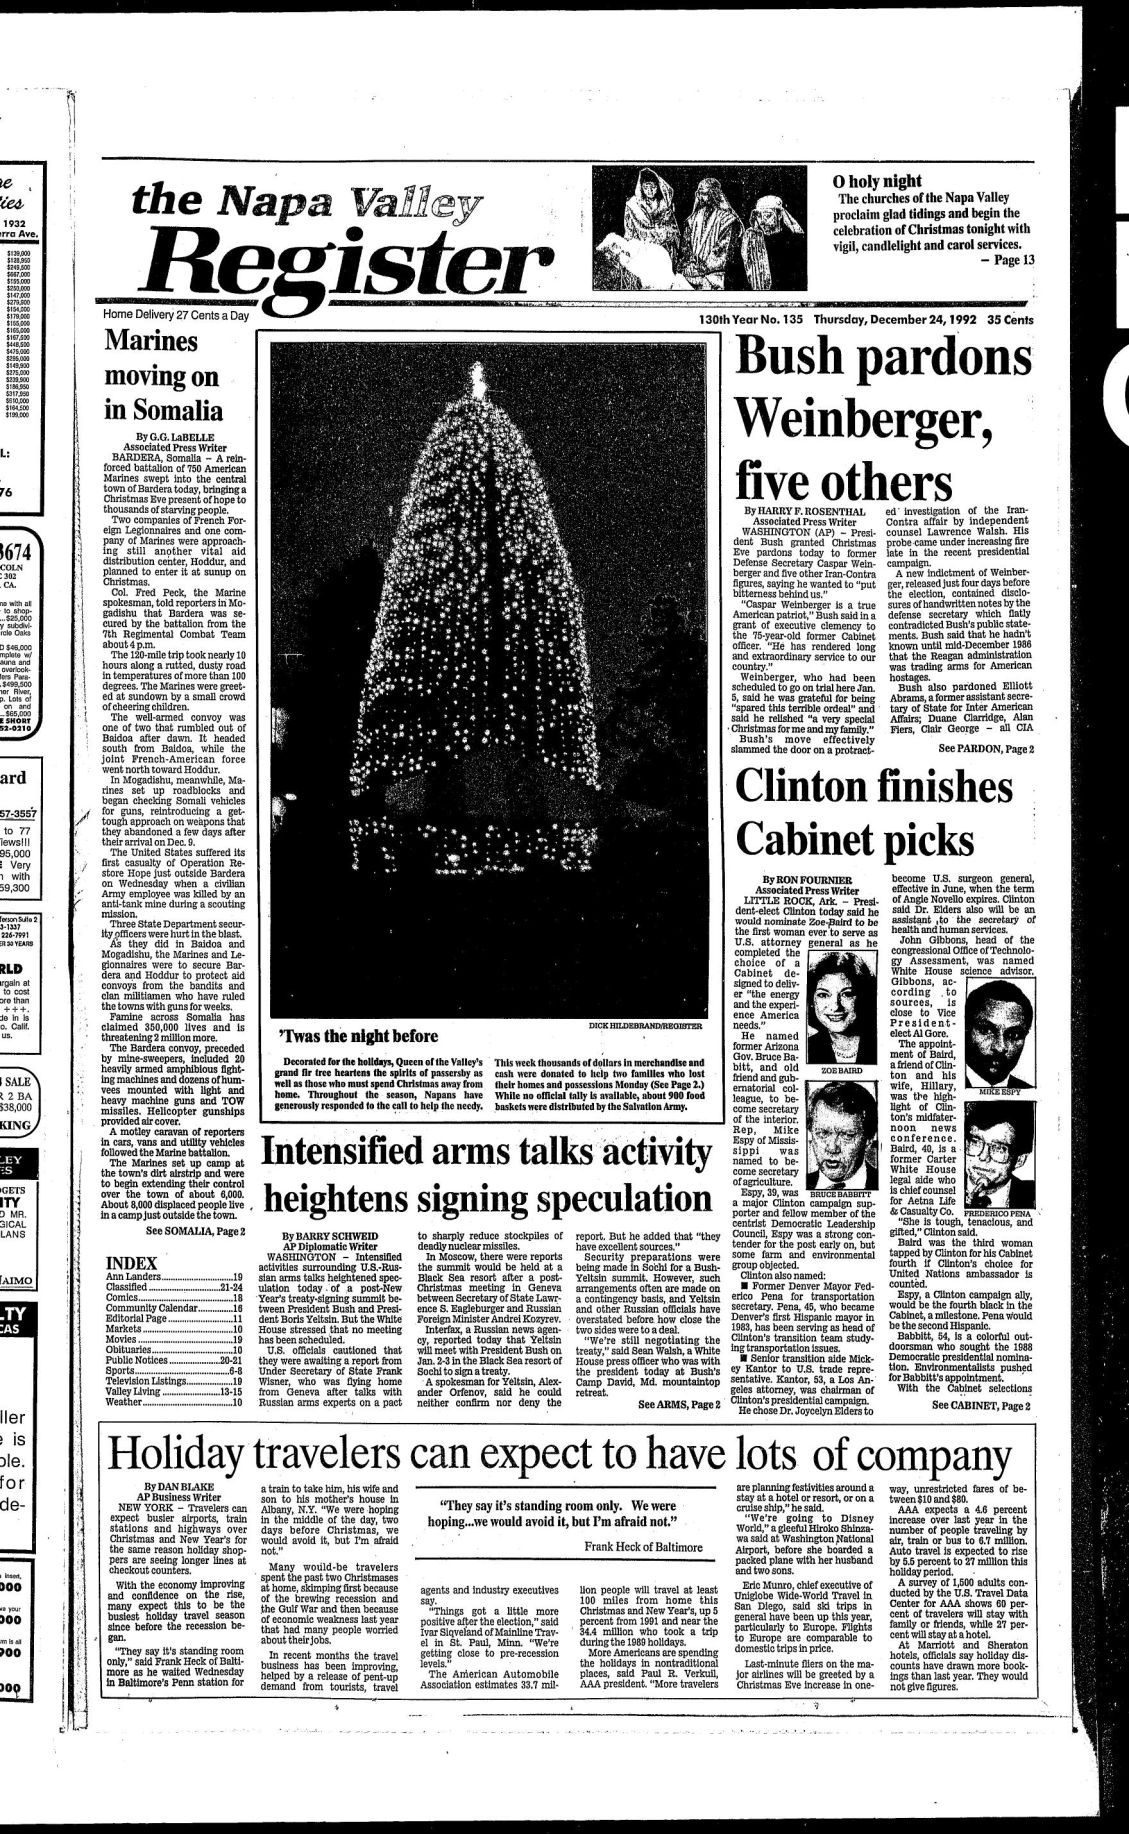 Dec. 24, 1992